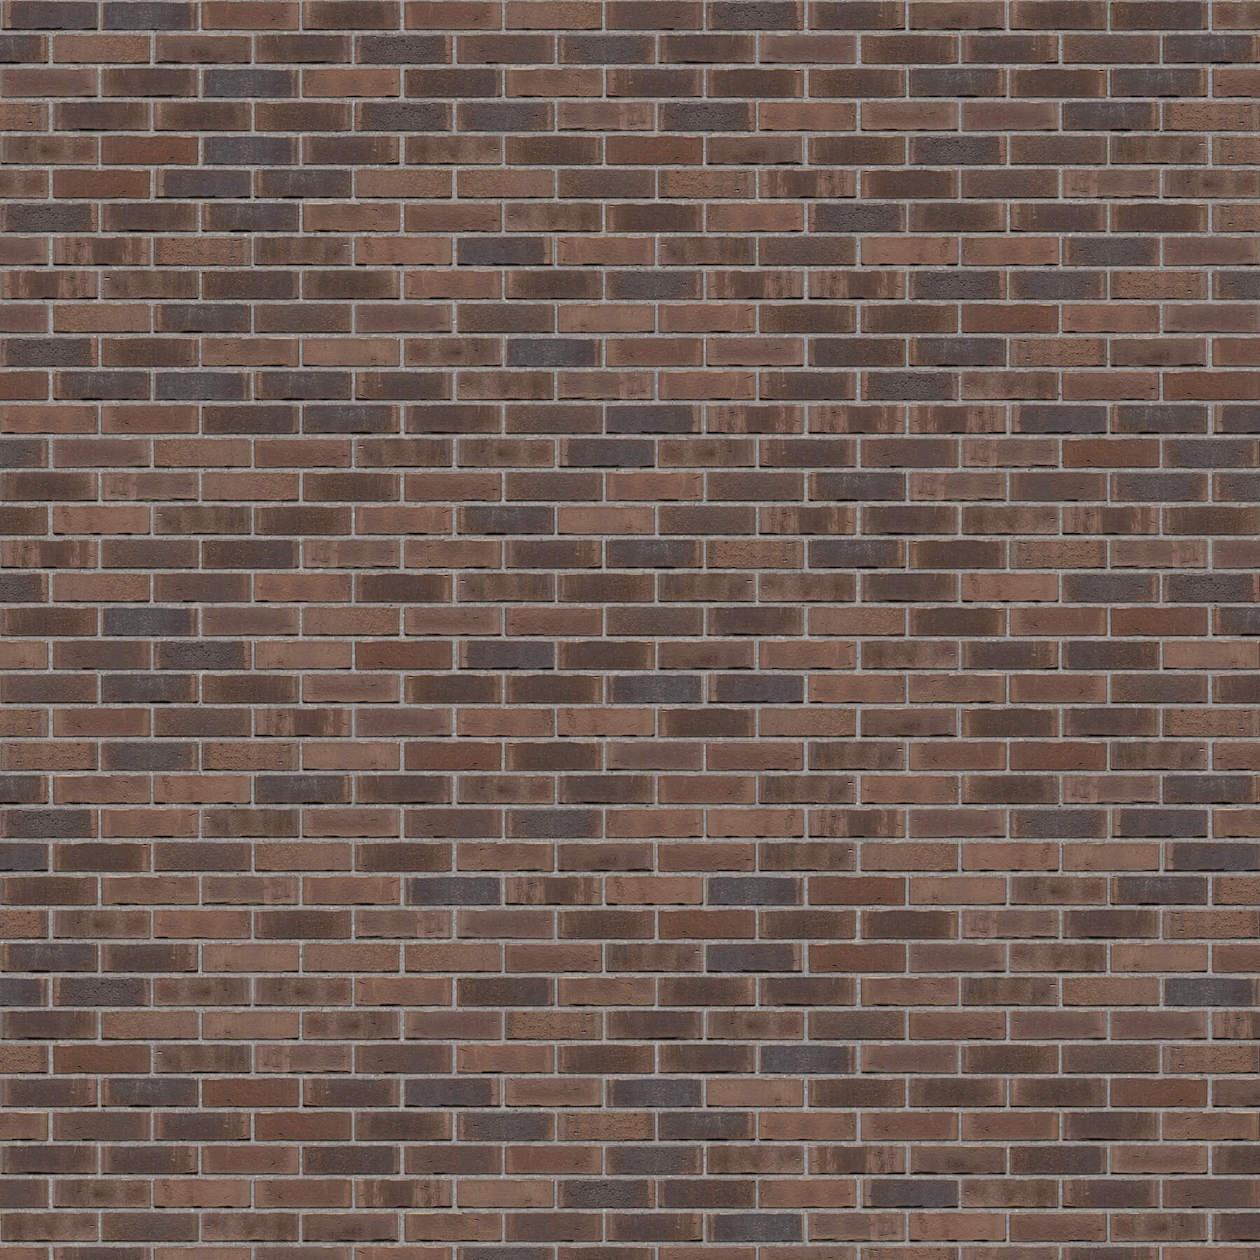 Puna-cigla-FeldHaus-Klinker-brick-house-nf-k-745-SIva Fuga